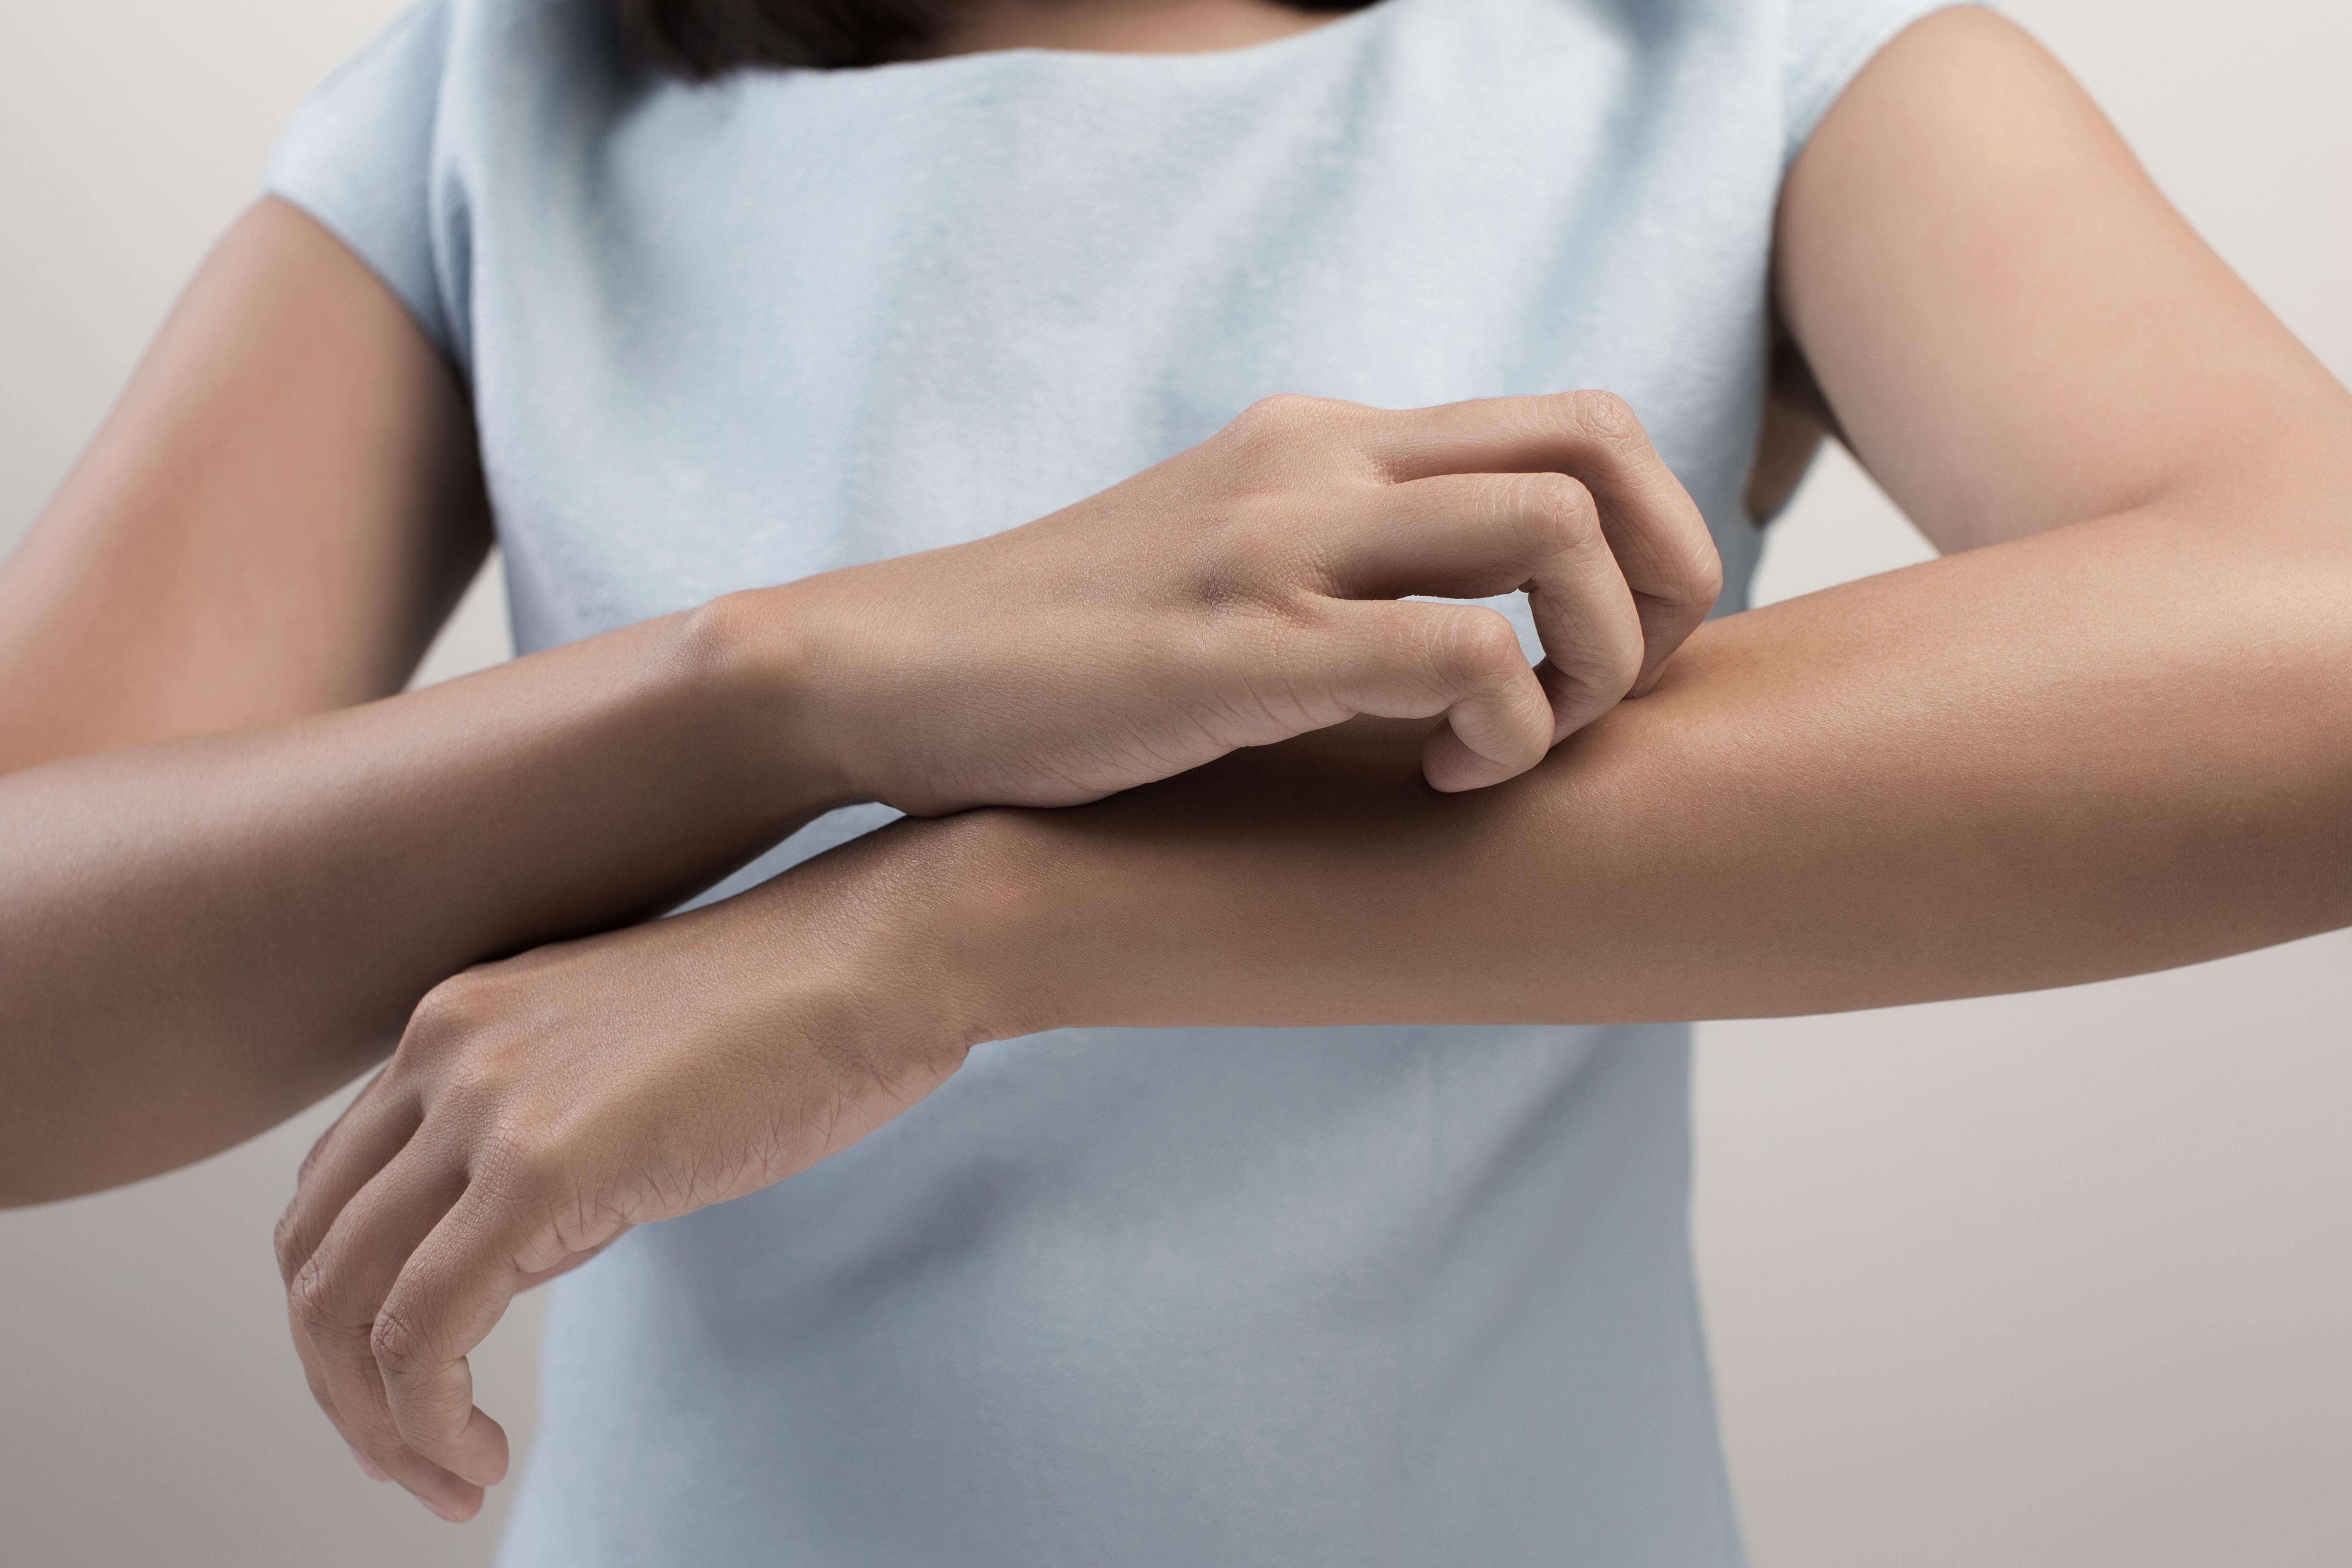 Choroby skóry a tatuaż - Poznańska Szkoła Tatuażu